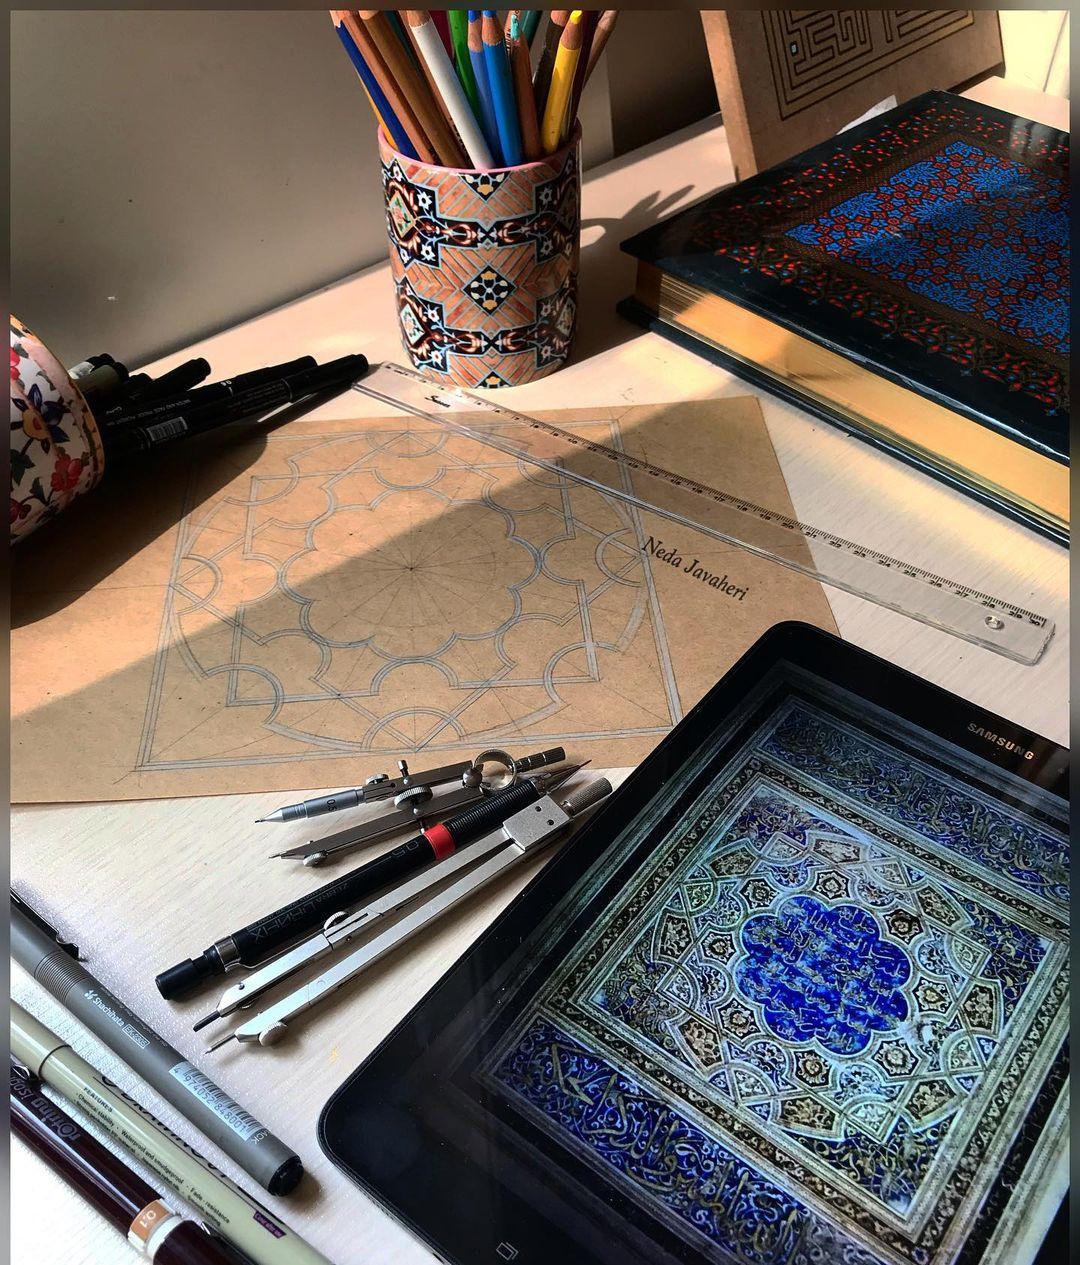 Karya Kaligrafi  آدمی به اشتیاق زندهاست، به اشتیاق دوست داشتن، خواستن، داشتن، به دست آوردن… آ…- Ne Javaher